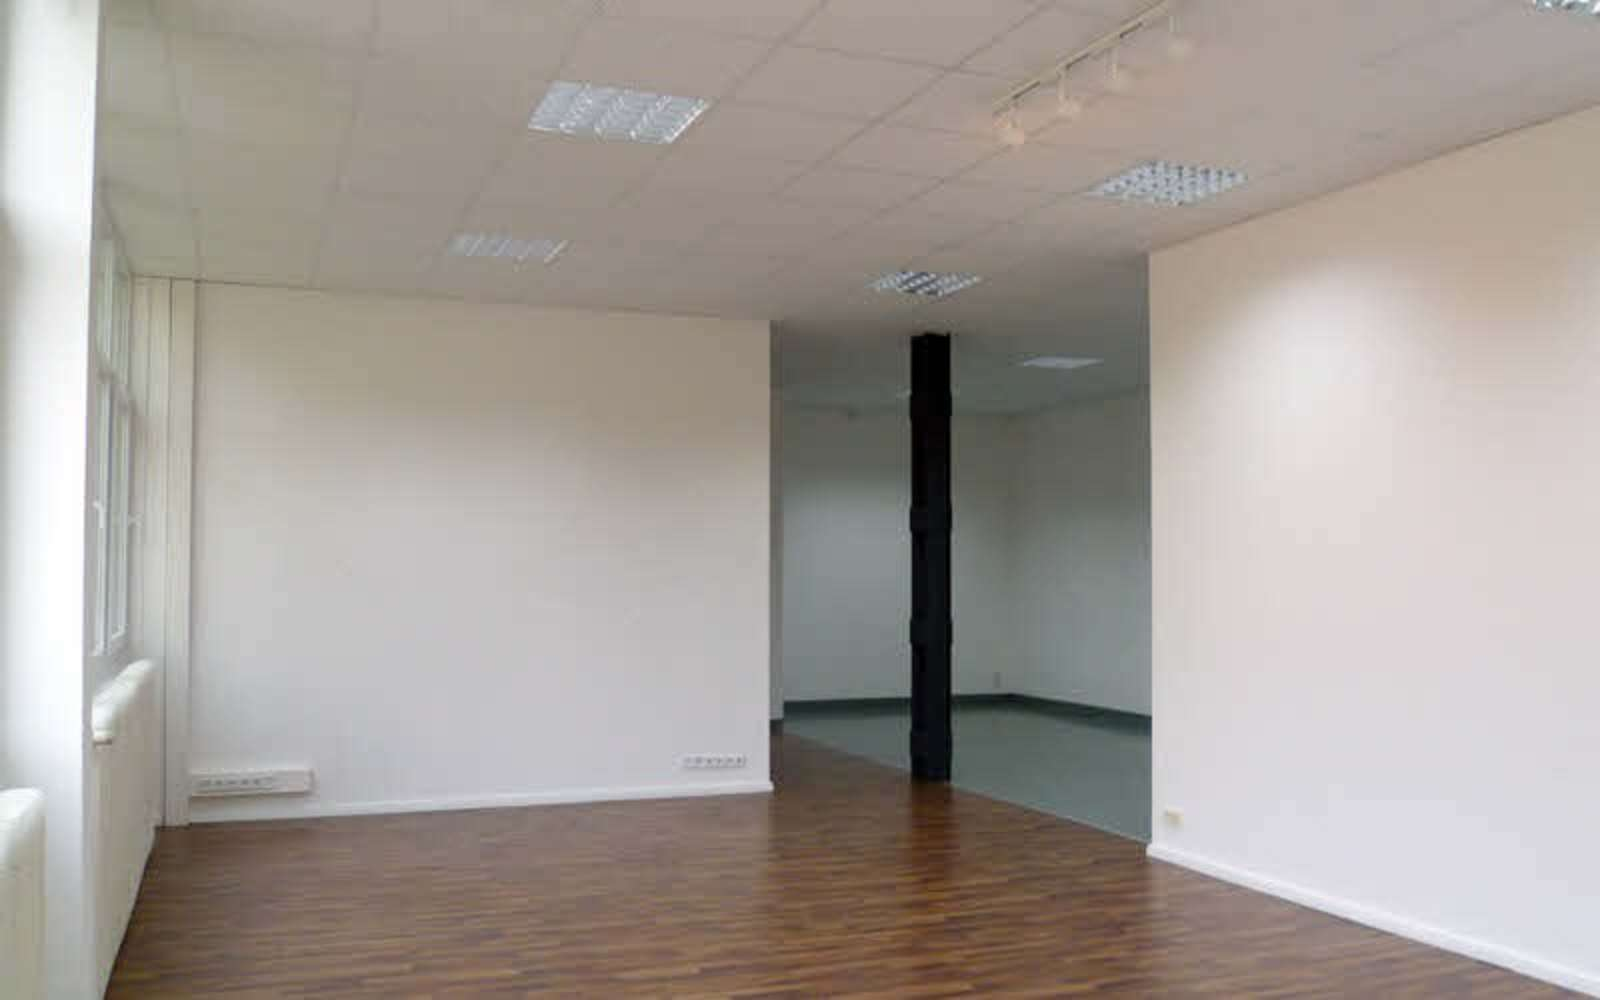 Büros Berlin, 13407 - Büro - Berlin, Reinickendorf - B1600 - 9915097